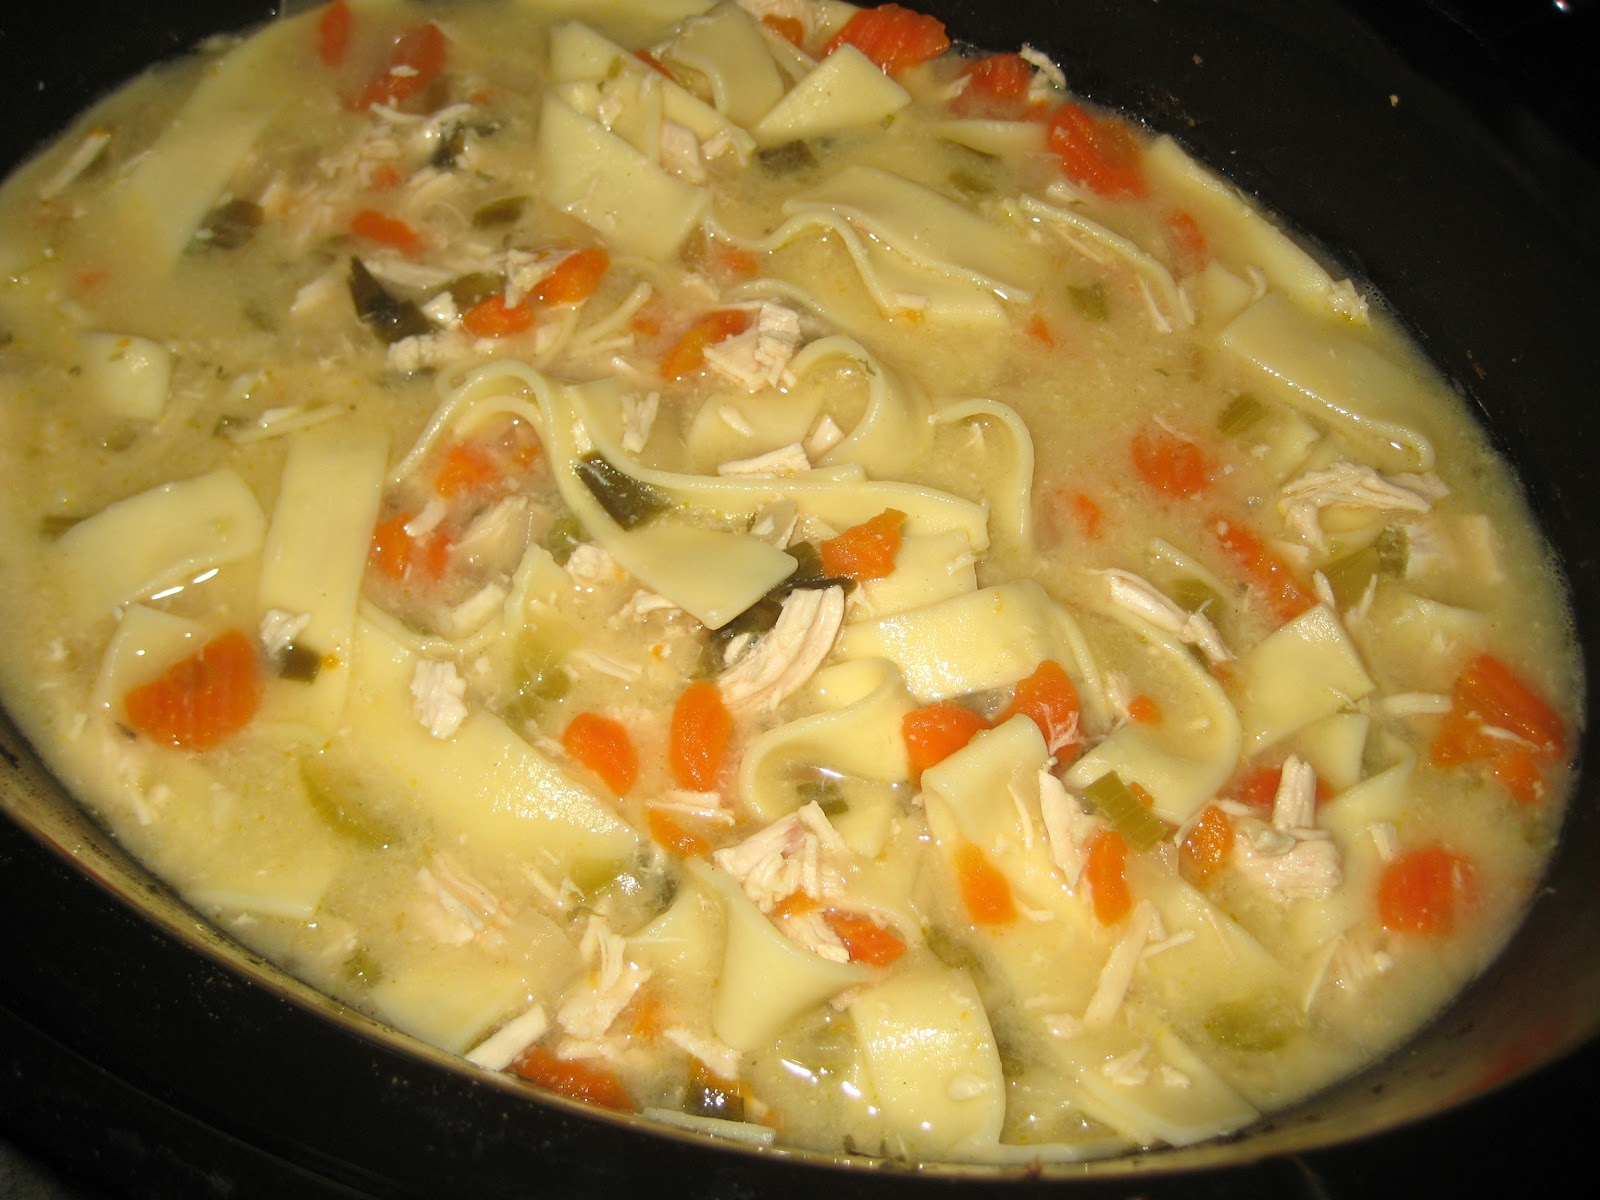 julie's crock of the week crock pot chicken noodle soup